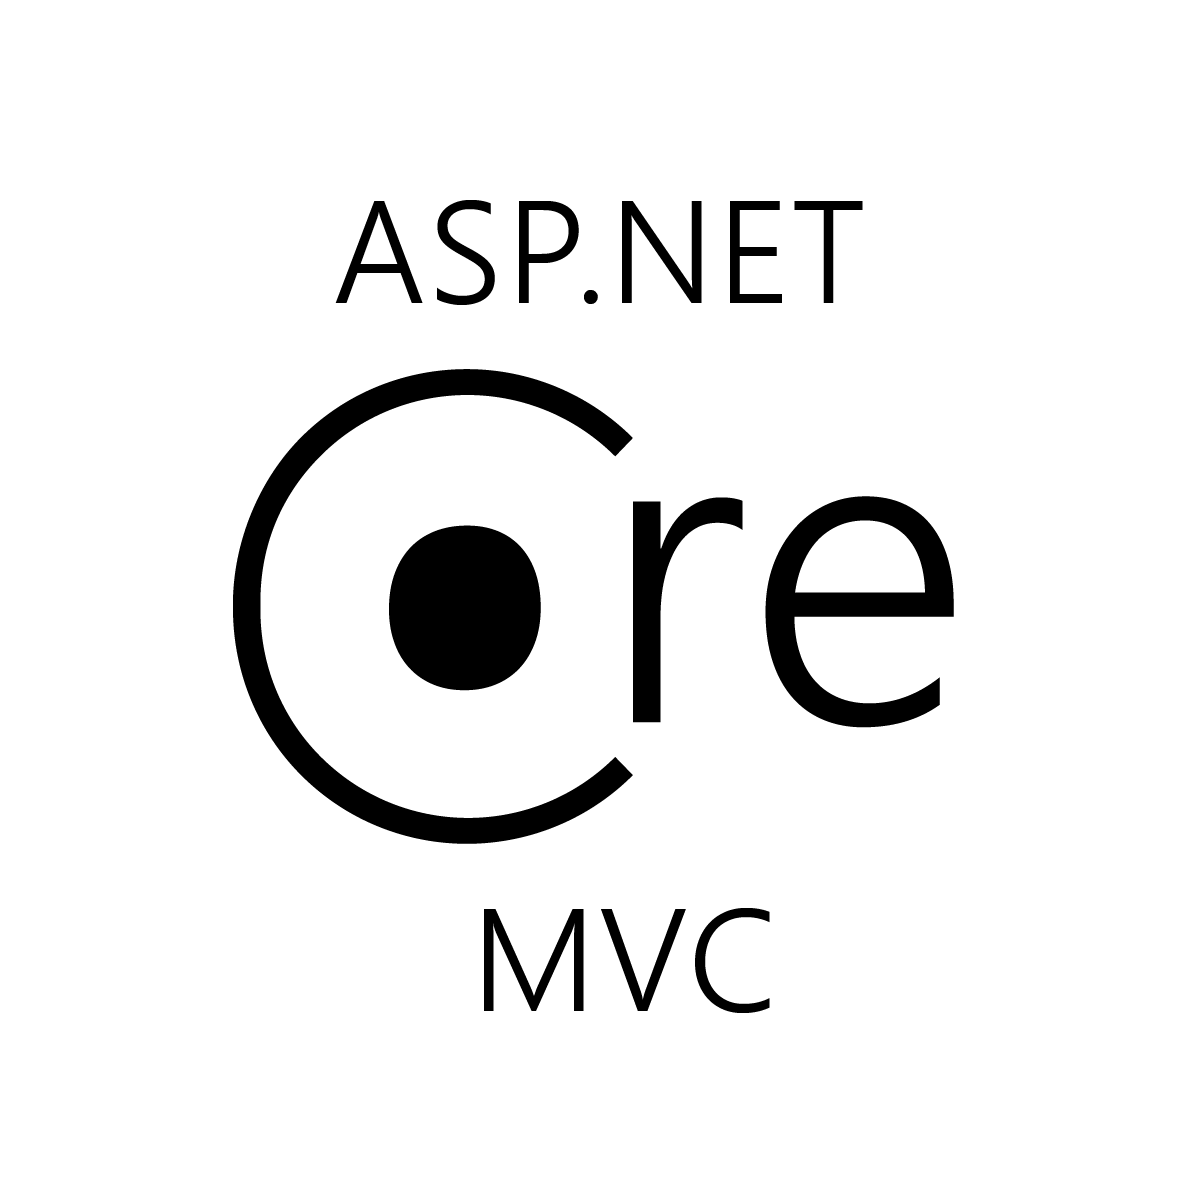 https://raw.githubusercontent.com/campusMVP/dotnetCoreLogoPack/master/ASP.NET%20Core%20MVC/Bitmap%20RGB/Bitmap-BIG_ASP.NET-Core-MVC-Logo_Black_Square_RGB.png